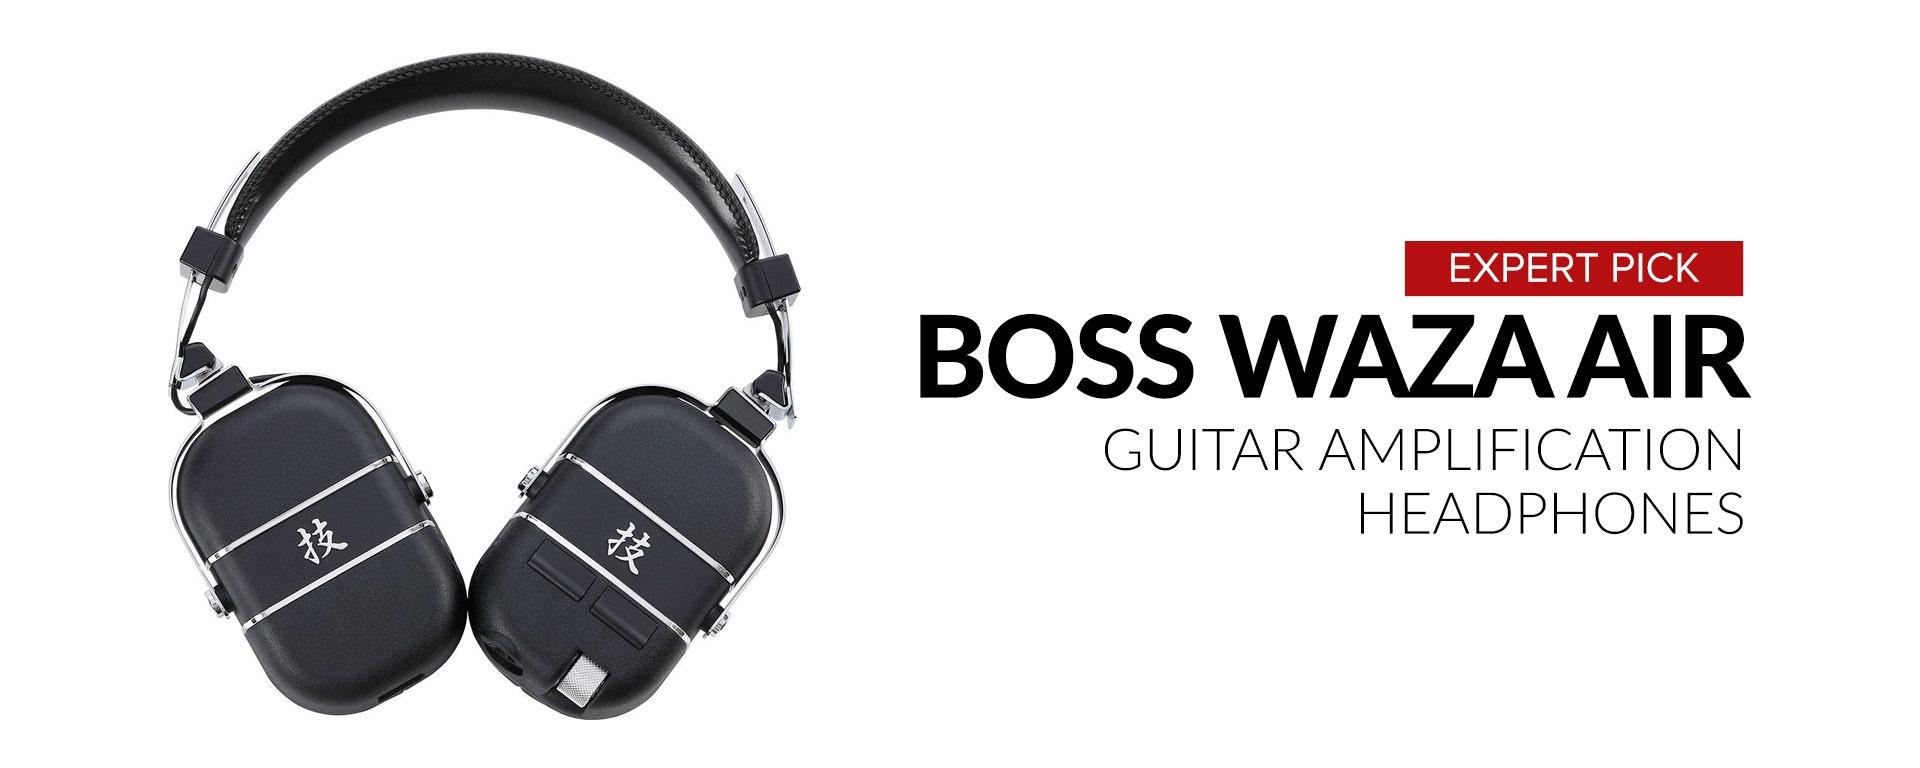 Boss: Waza Air Wireless Guitar Amplification Headphones